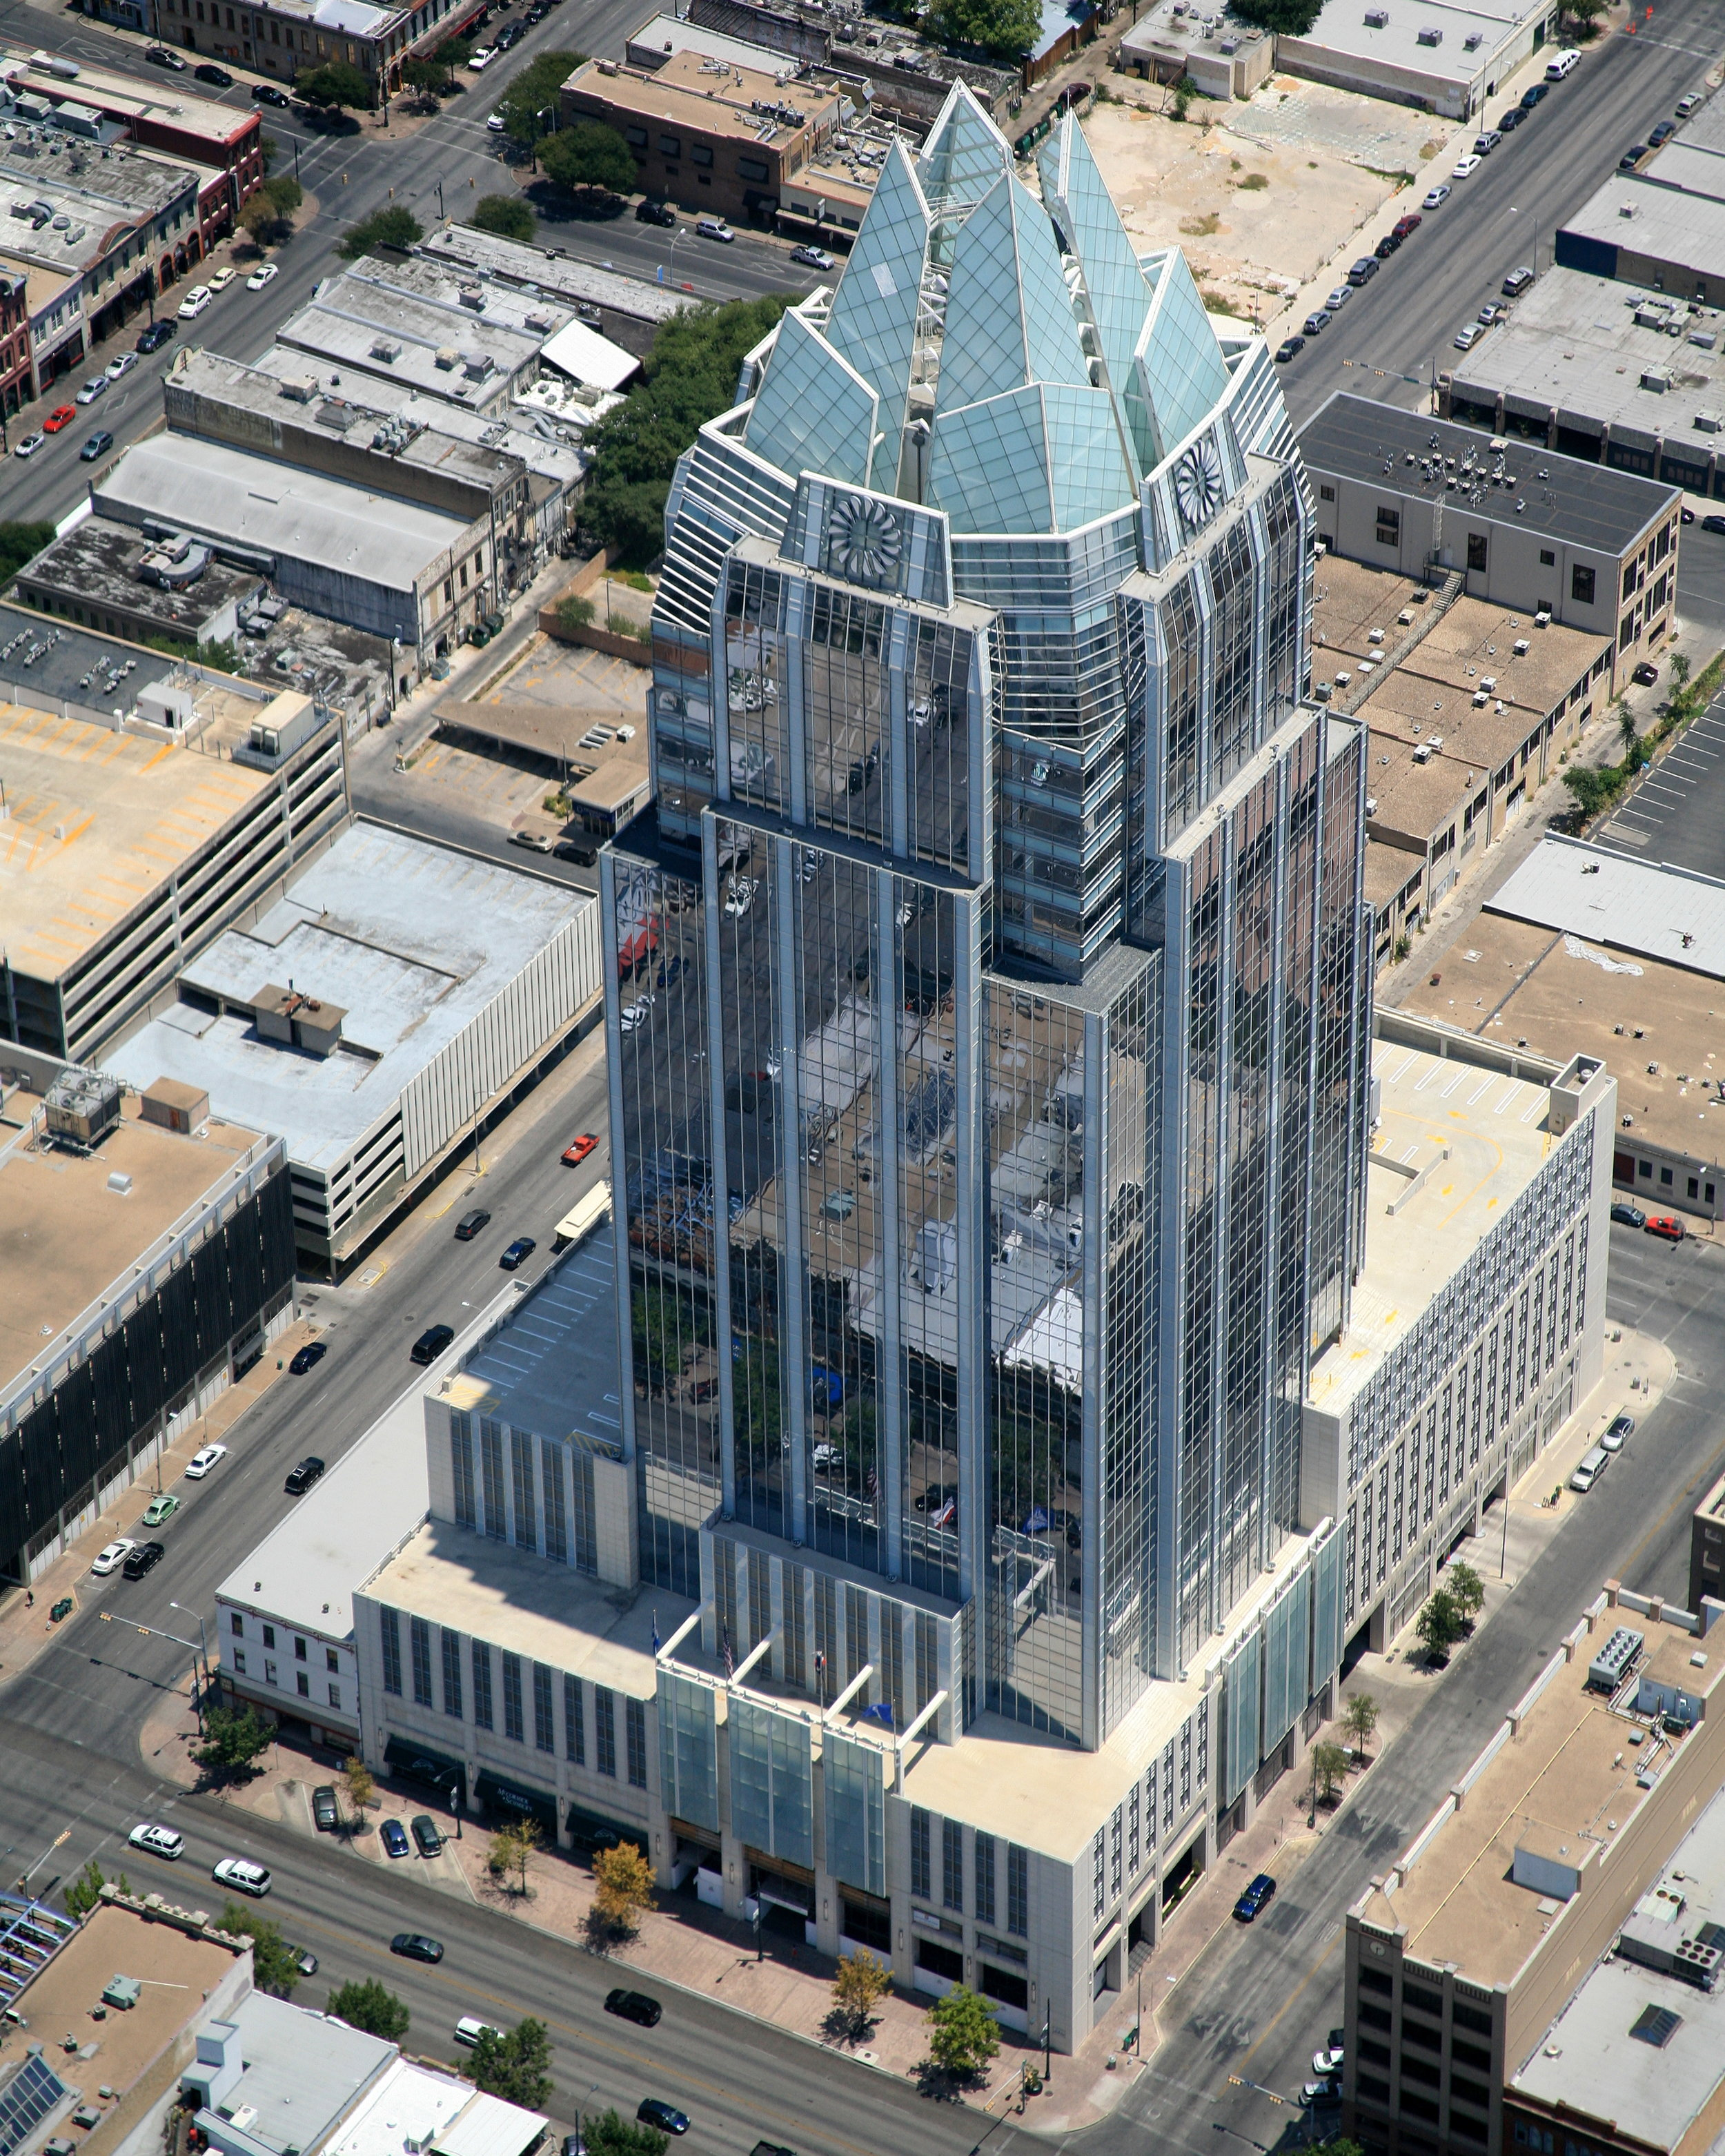 Frost Bank, Austin, Texas - Austin Aerial Photographer - Austin Drone Photography - Austin, TX